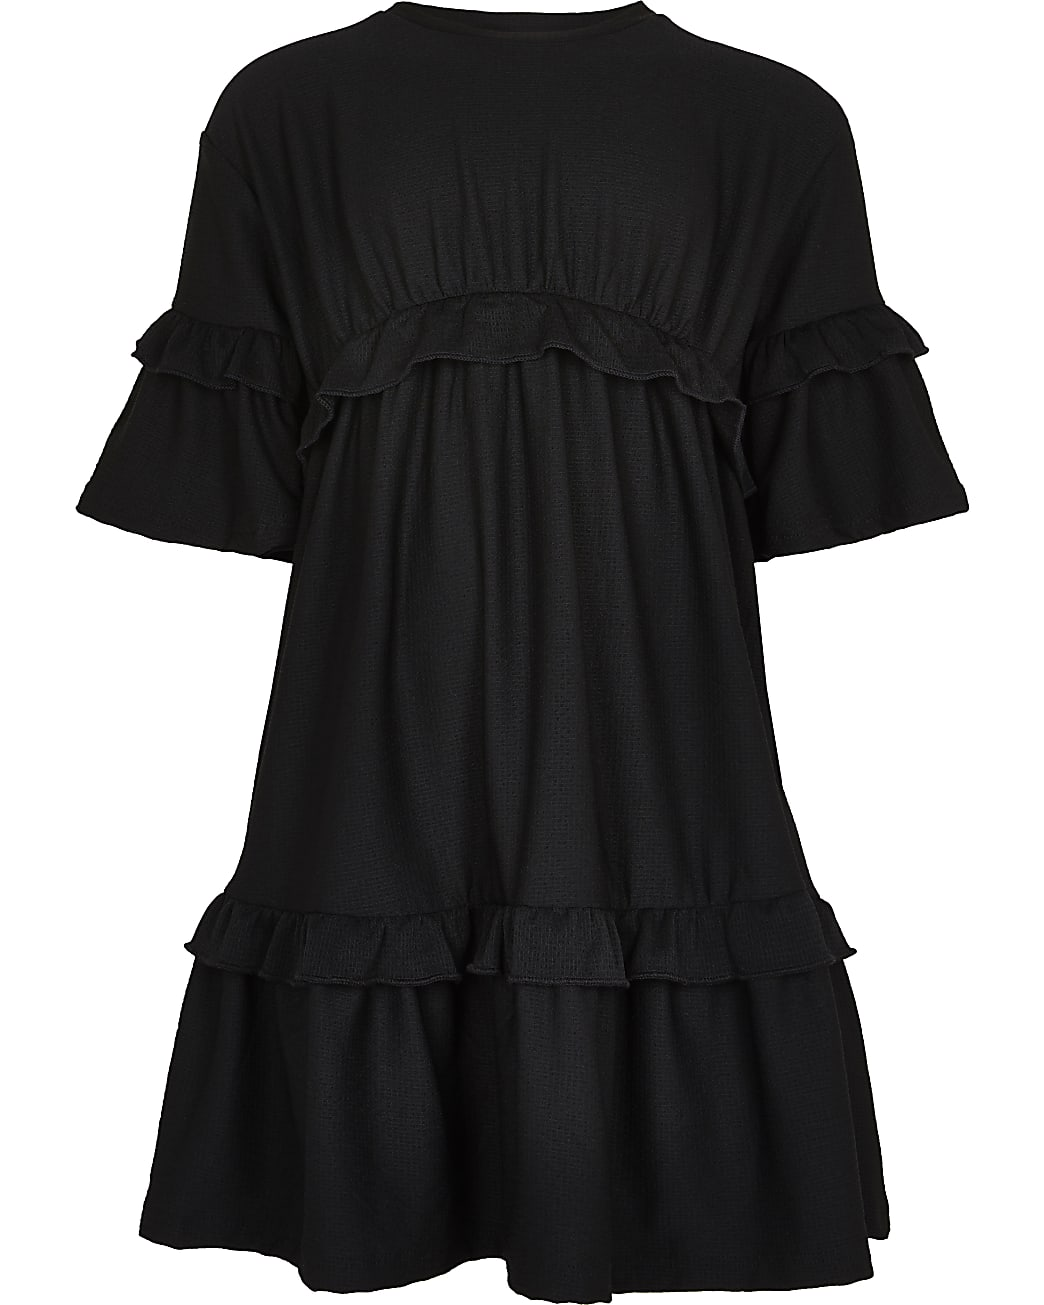 Age 13+ girls black frill hem t-shirt dress